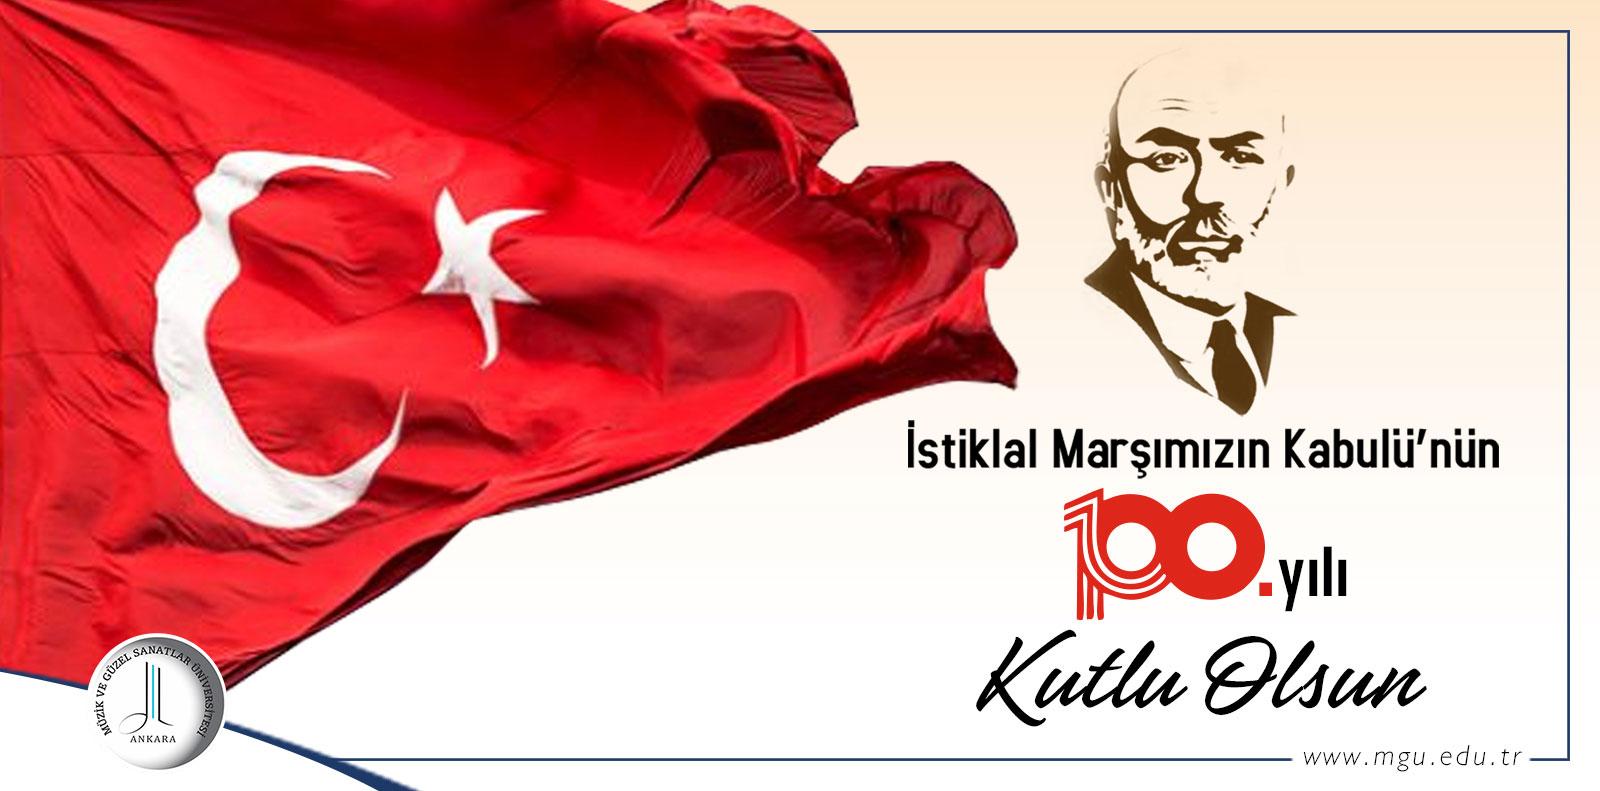 İstiklal Marşı'nın Kabulünün 100. Yılı Slide